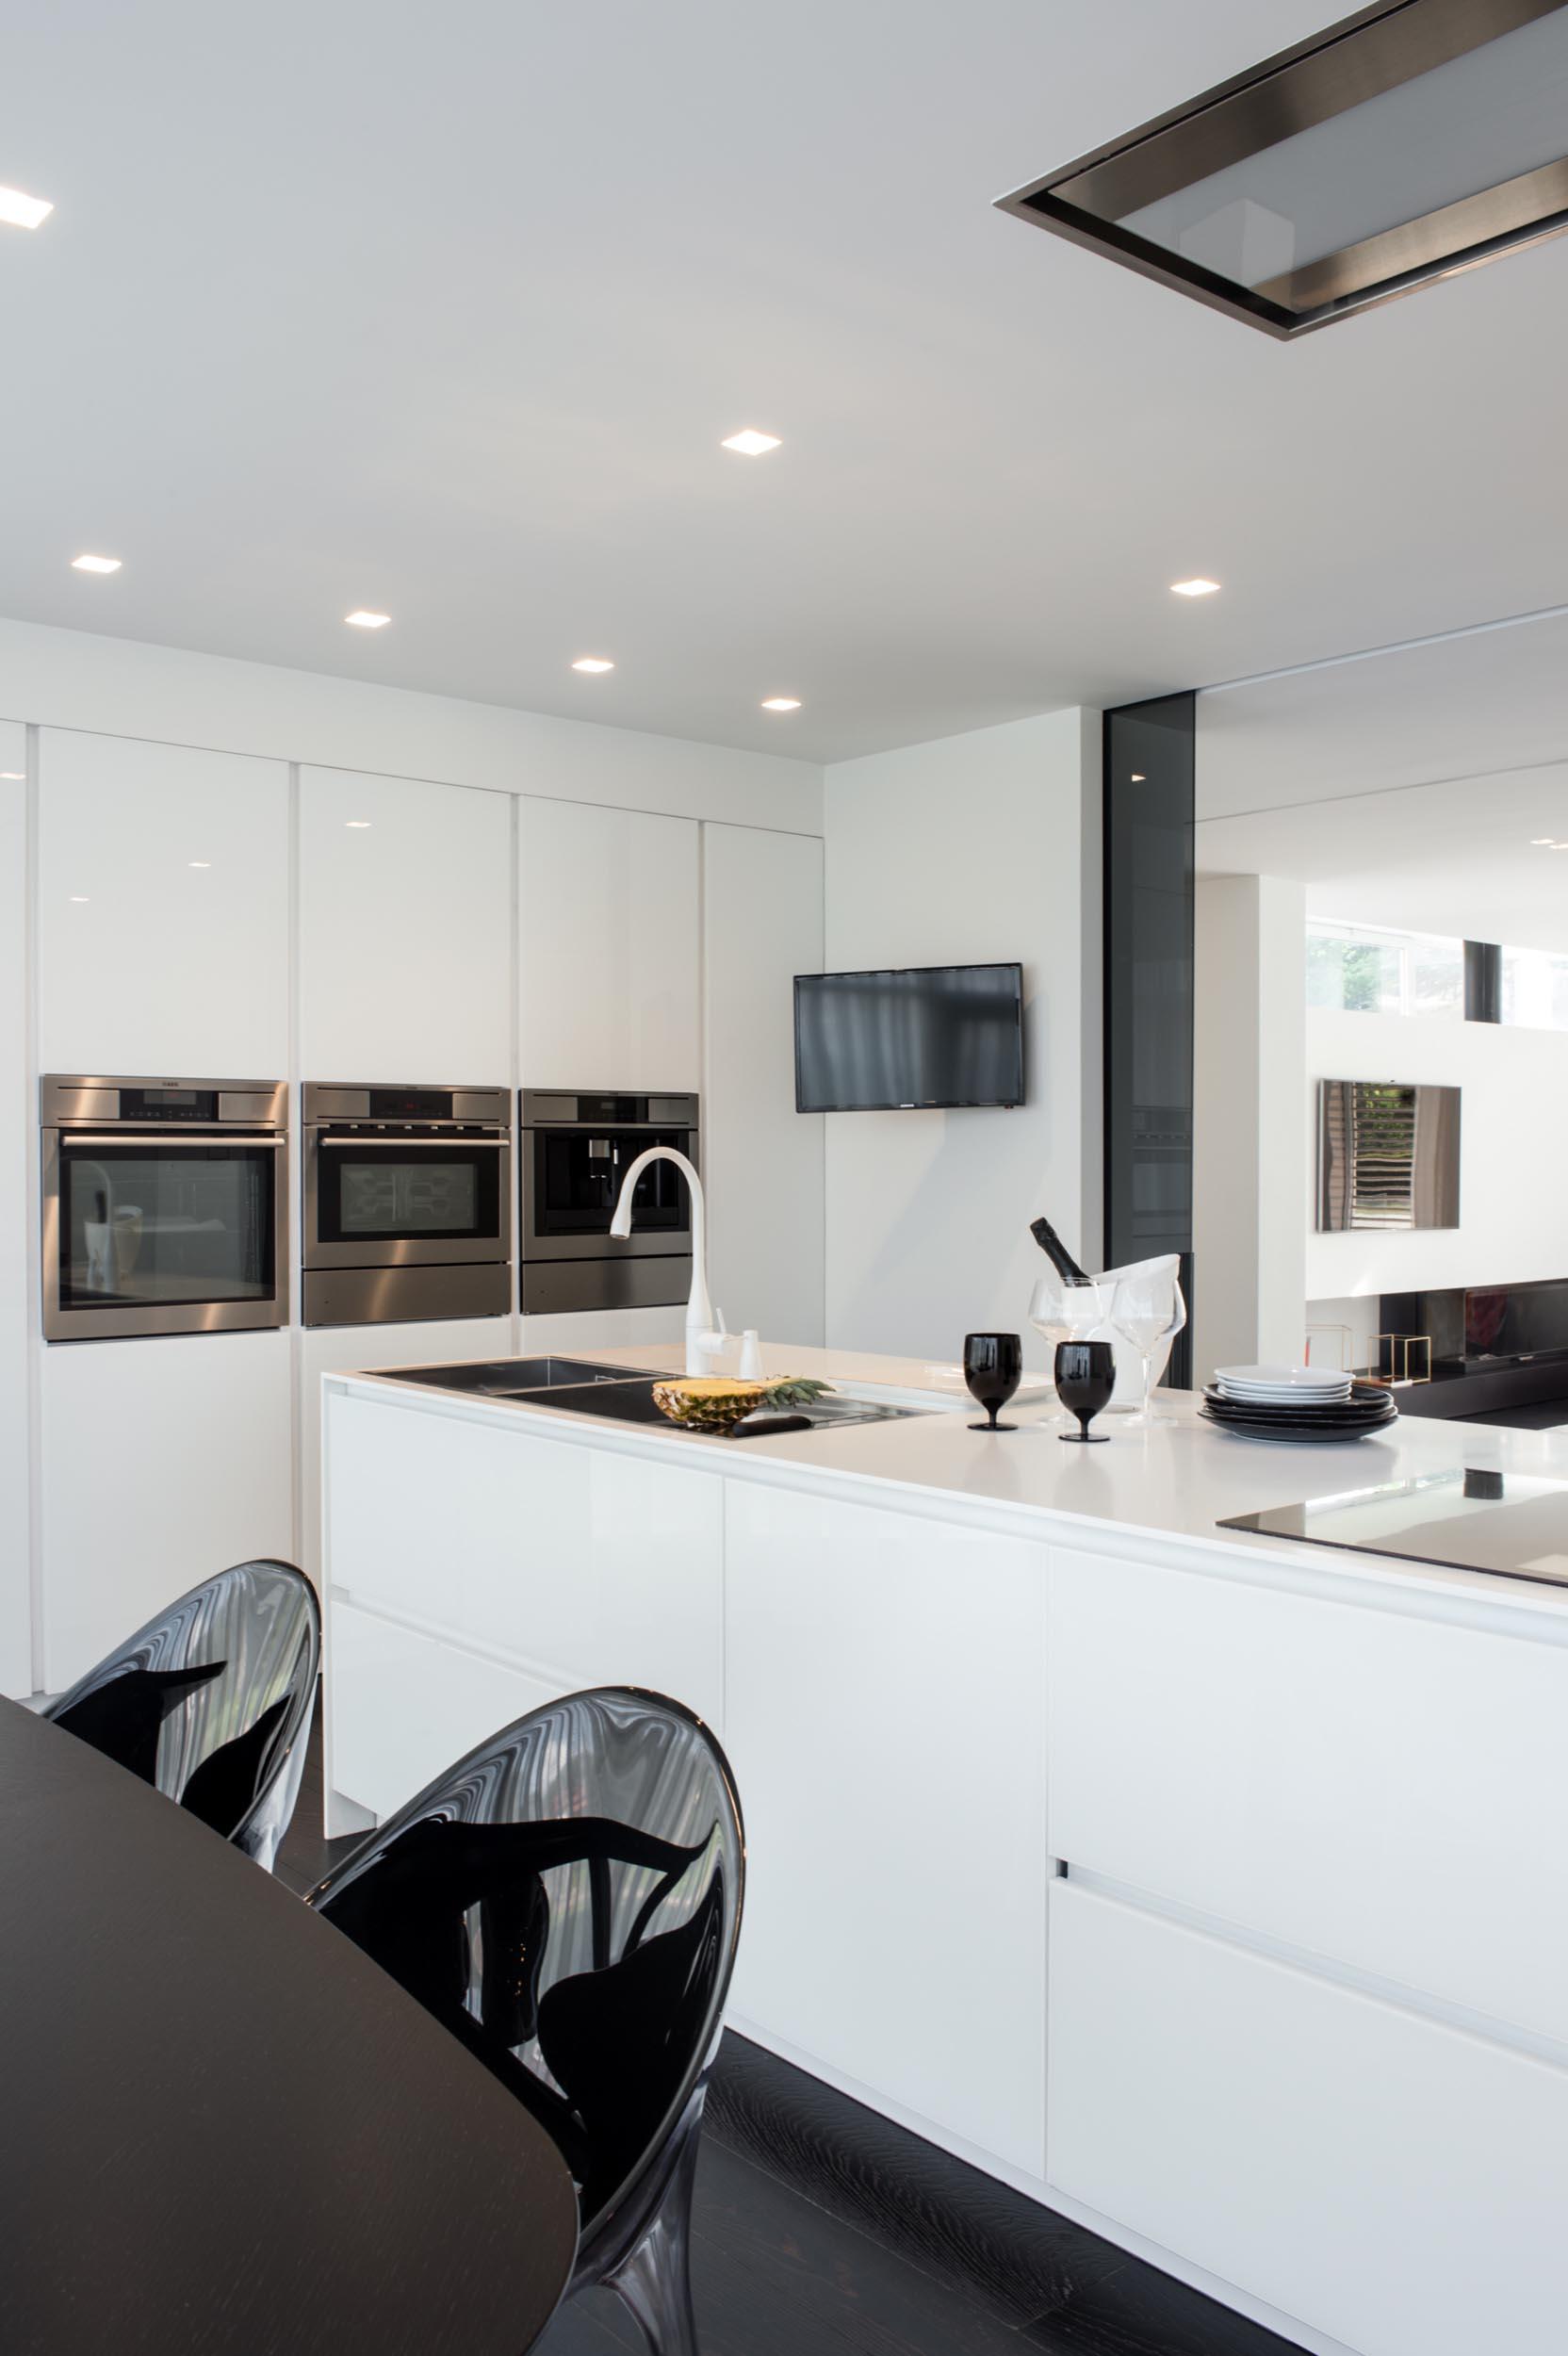 A modern kitchen with minimalist white cabinets.